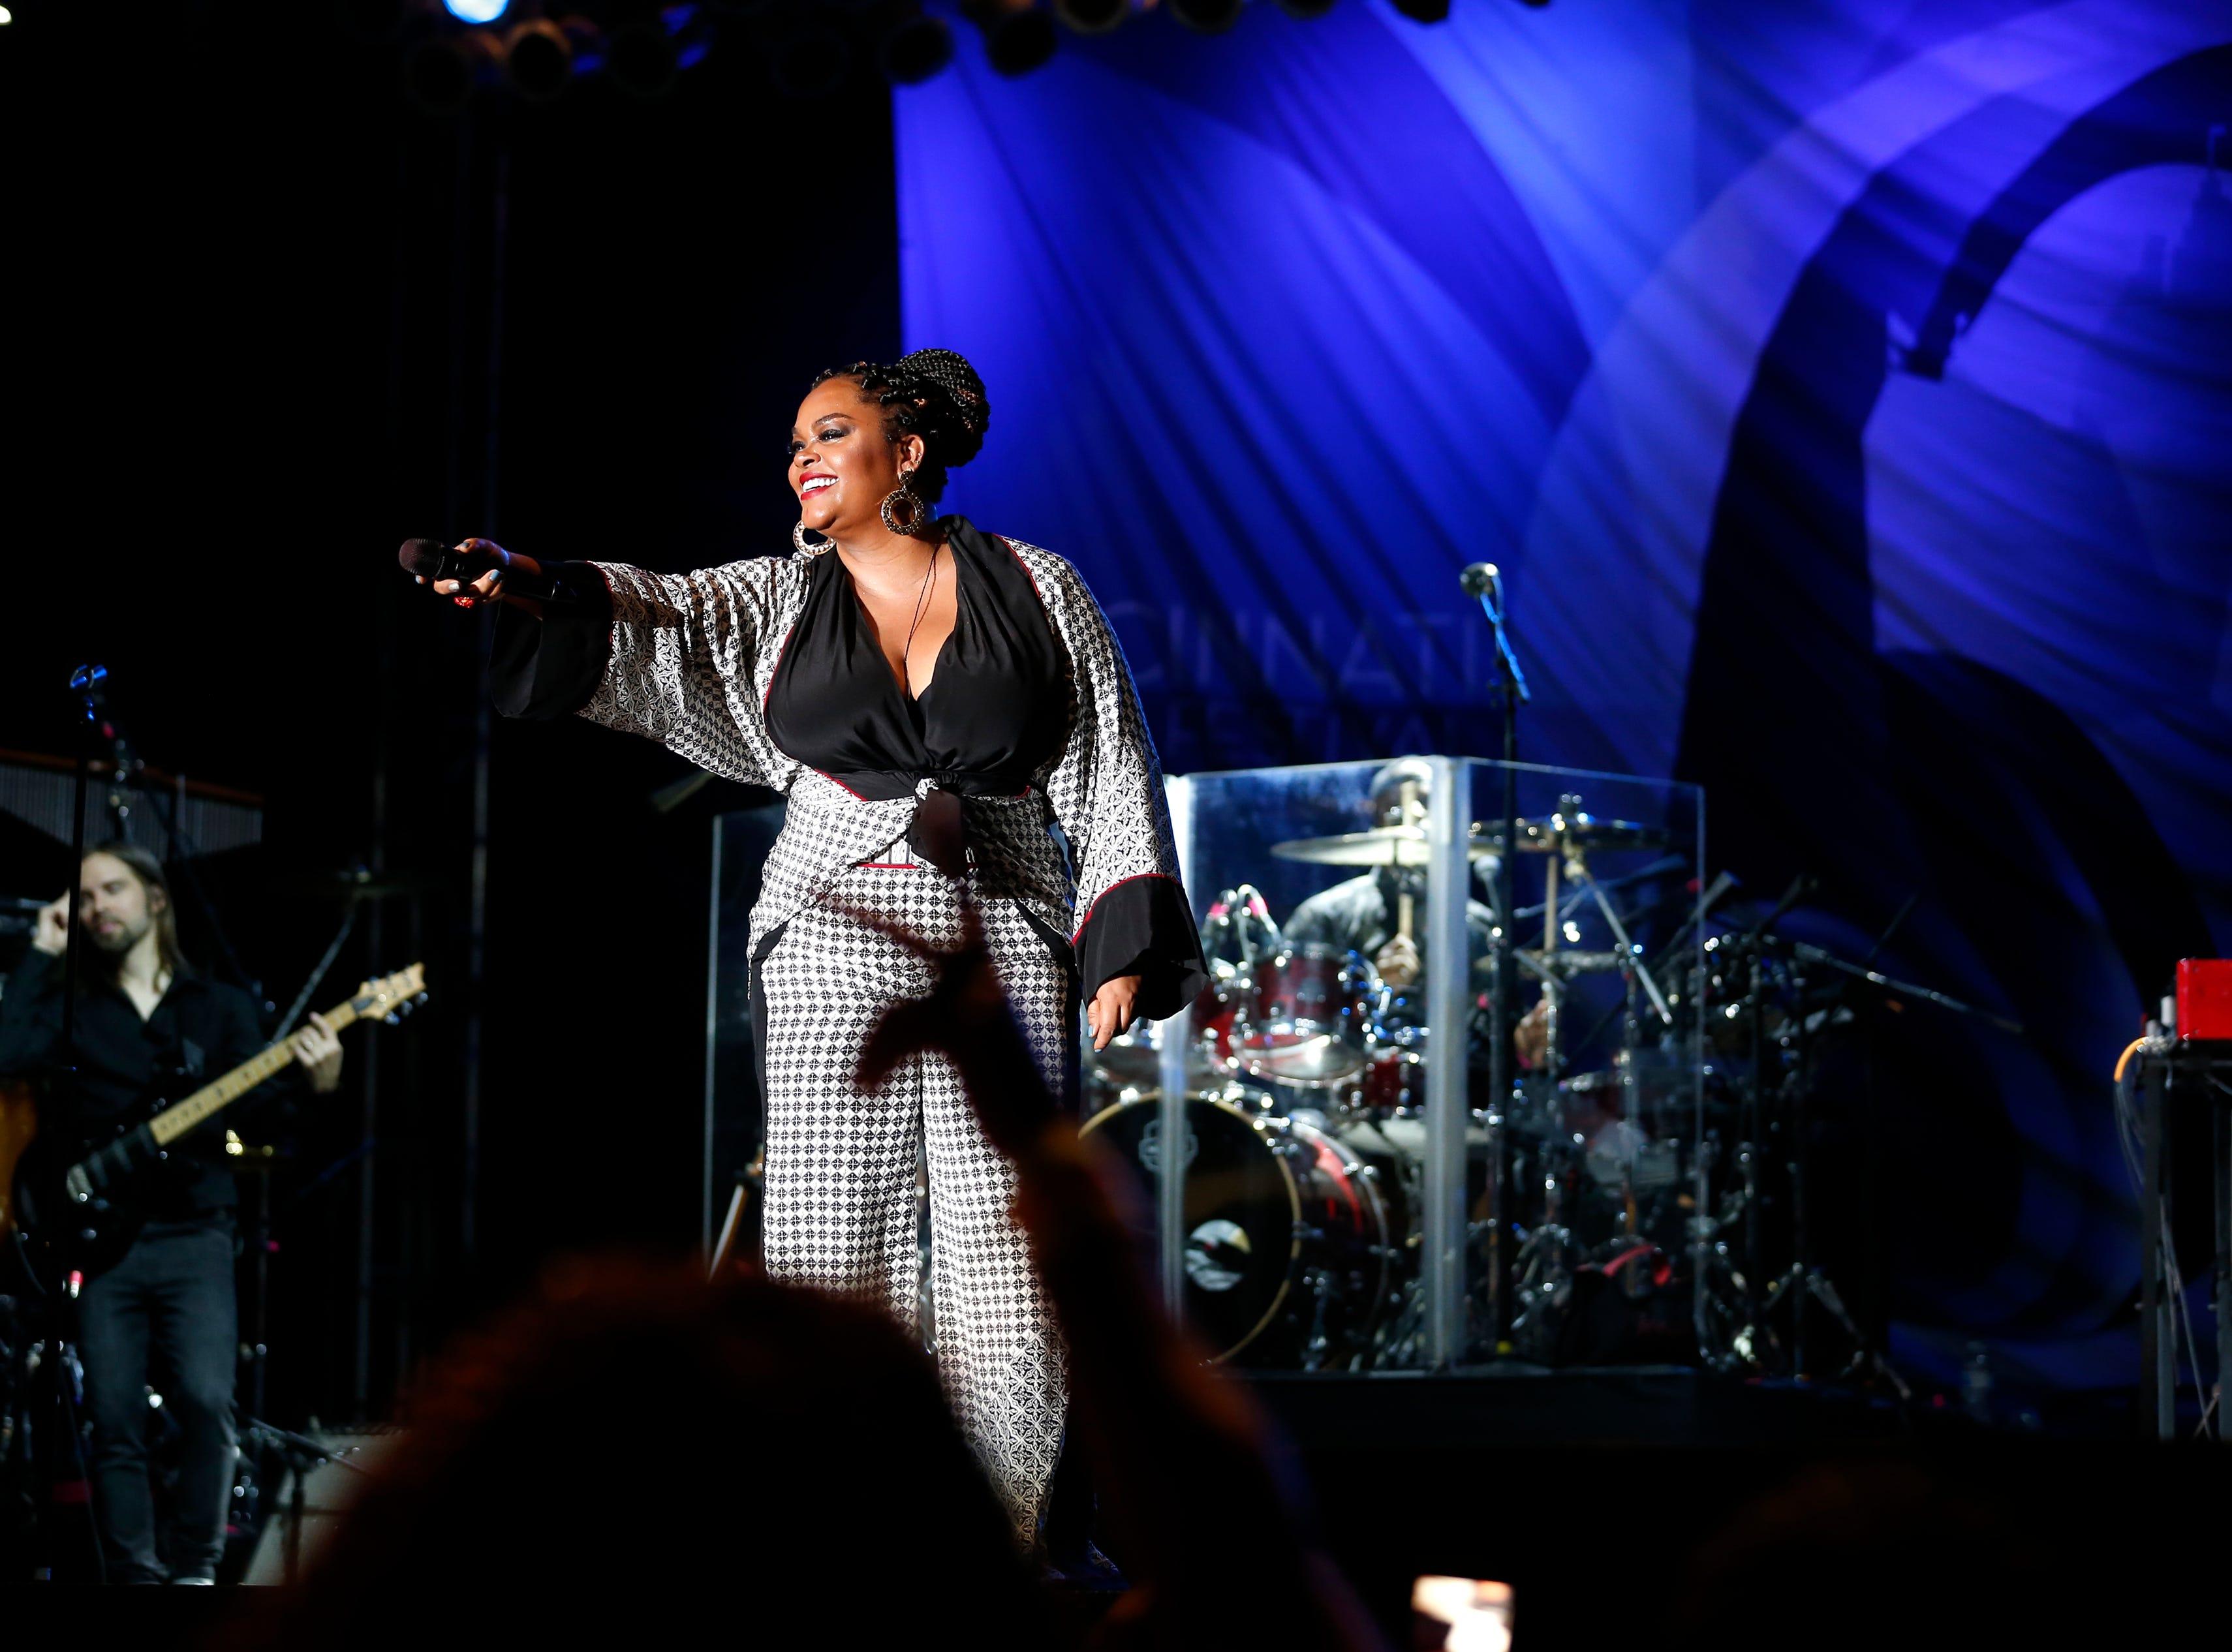 Jill Scott performs during the Cincinnati Music Festival.